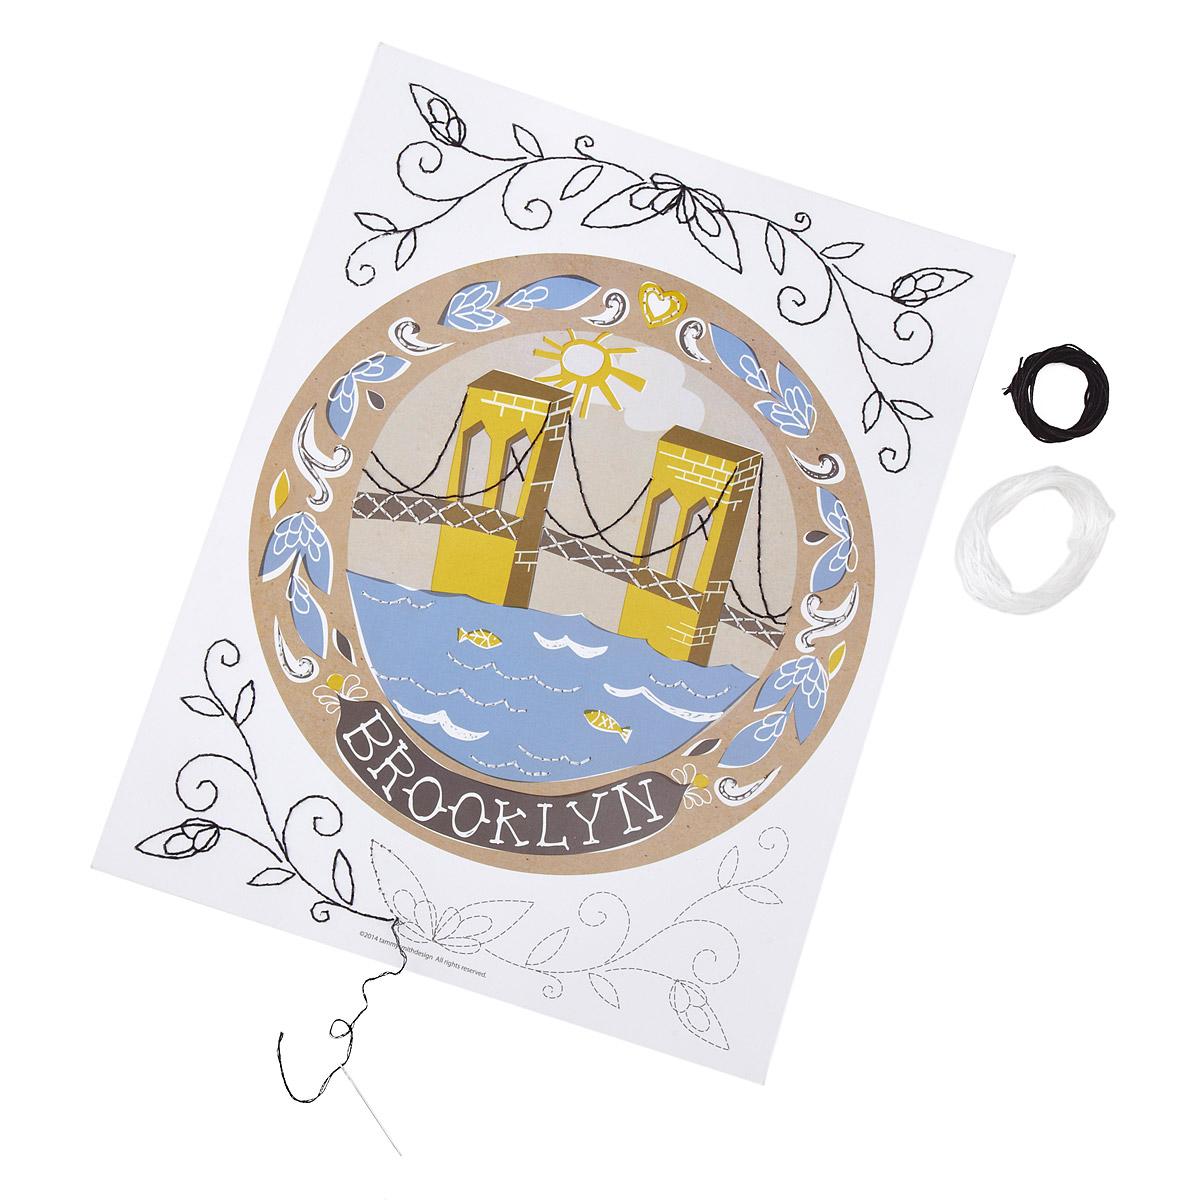 Brooklyn embroidery